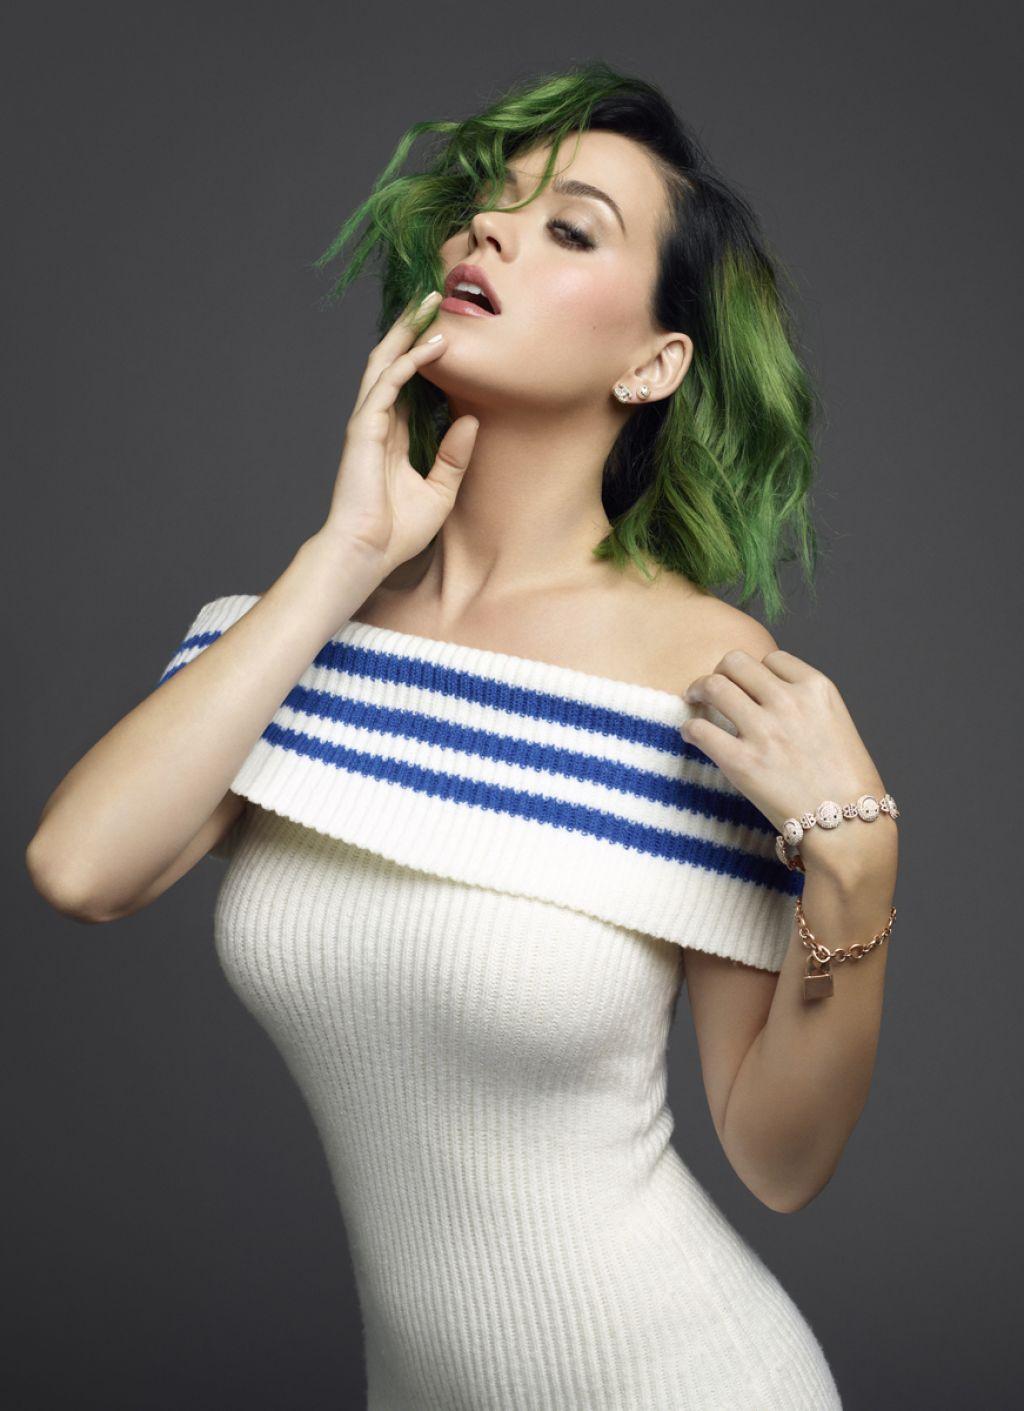 Katy Perry - Photoshoot 2014 (by Lauren Dukoff)